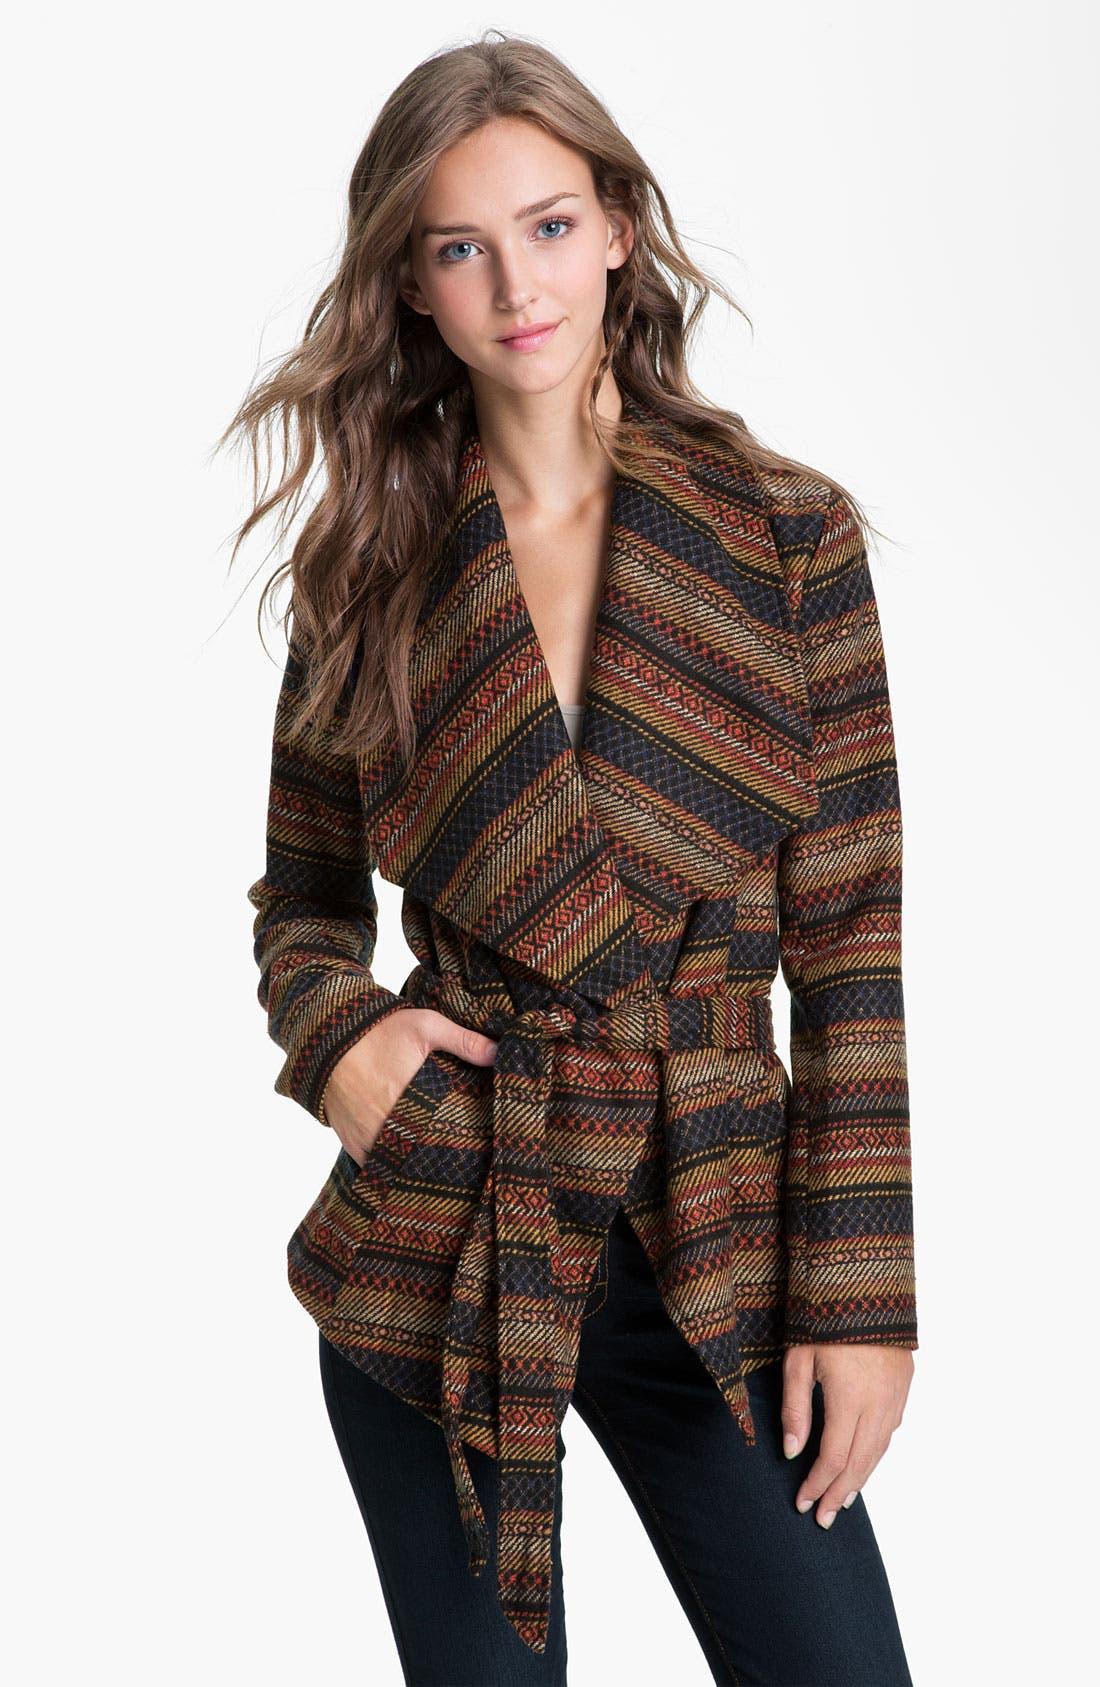 Alternate Image 1 Selected - Jack Southwestern Blanket Coat (Juniors)